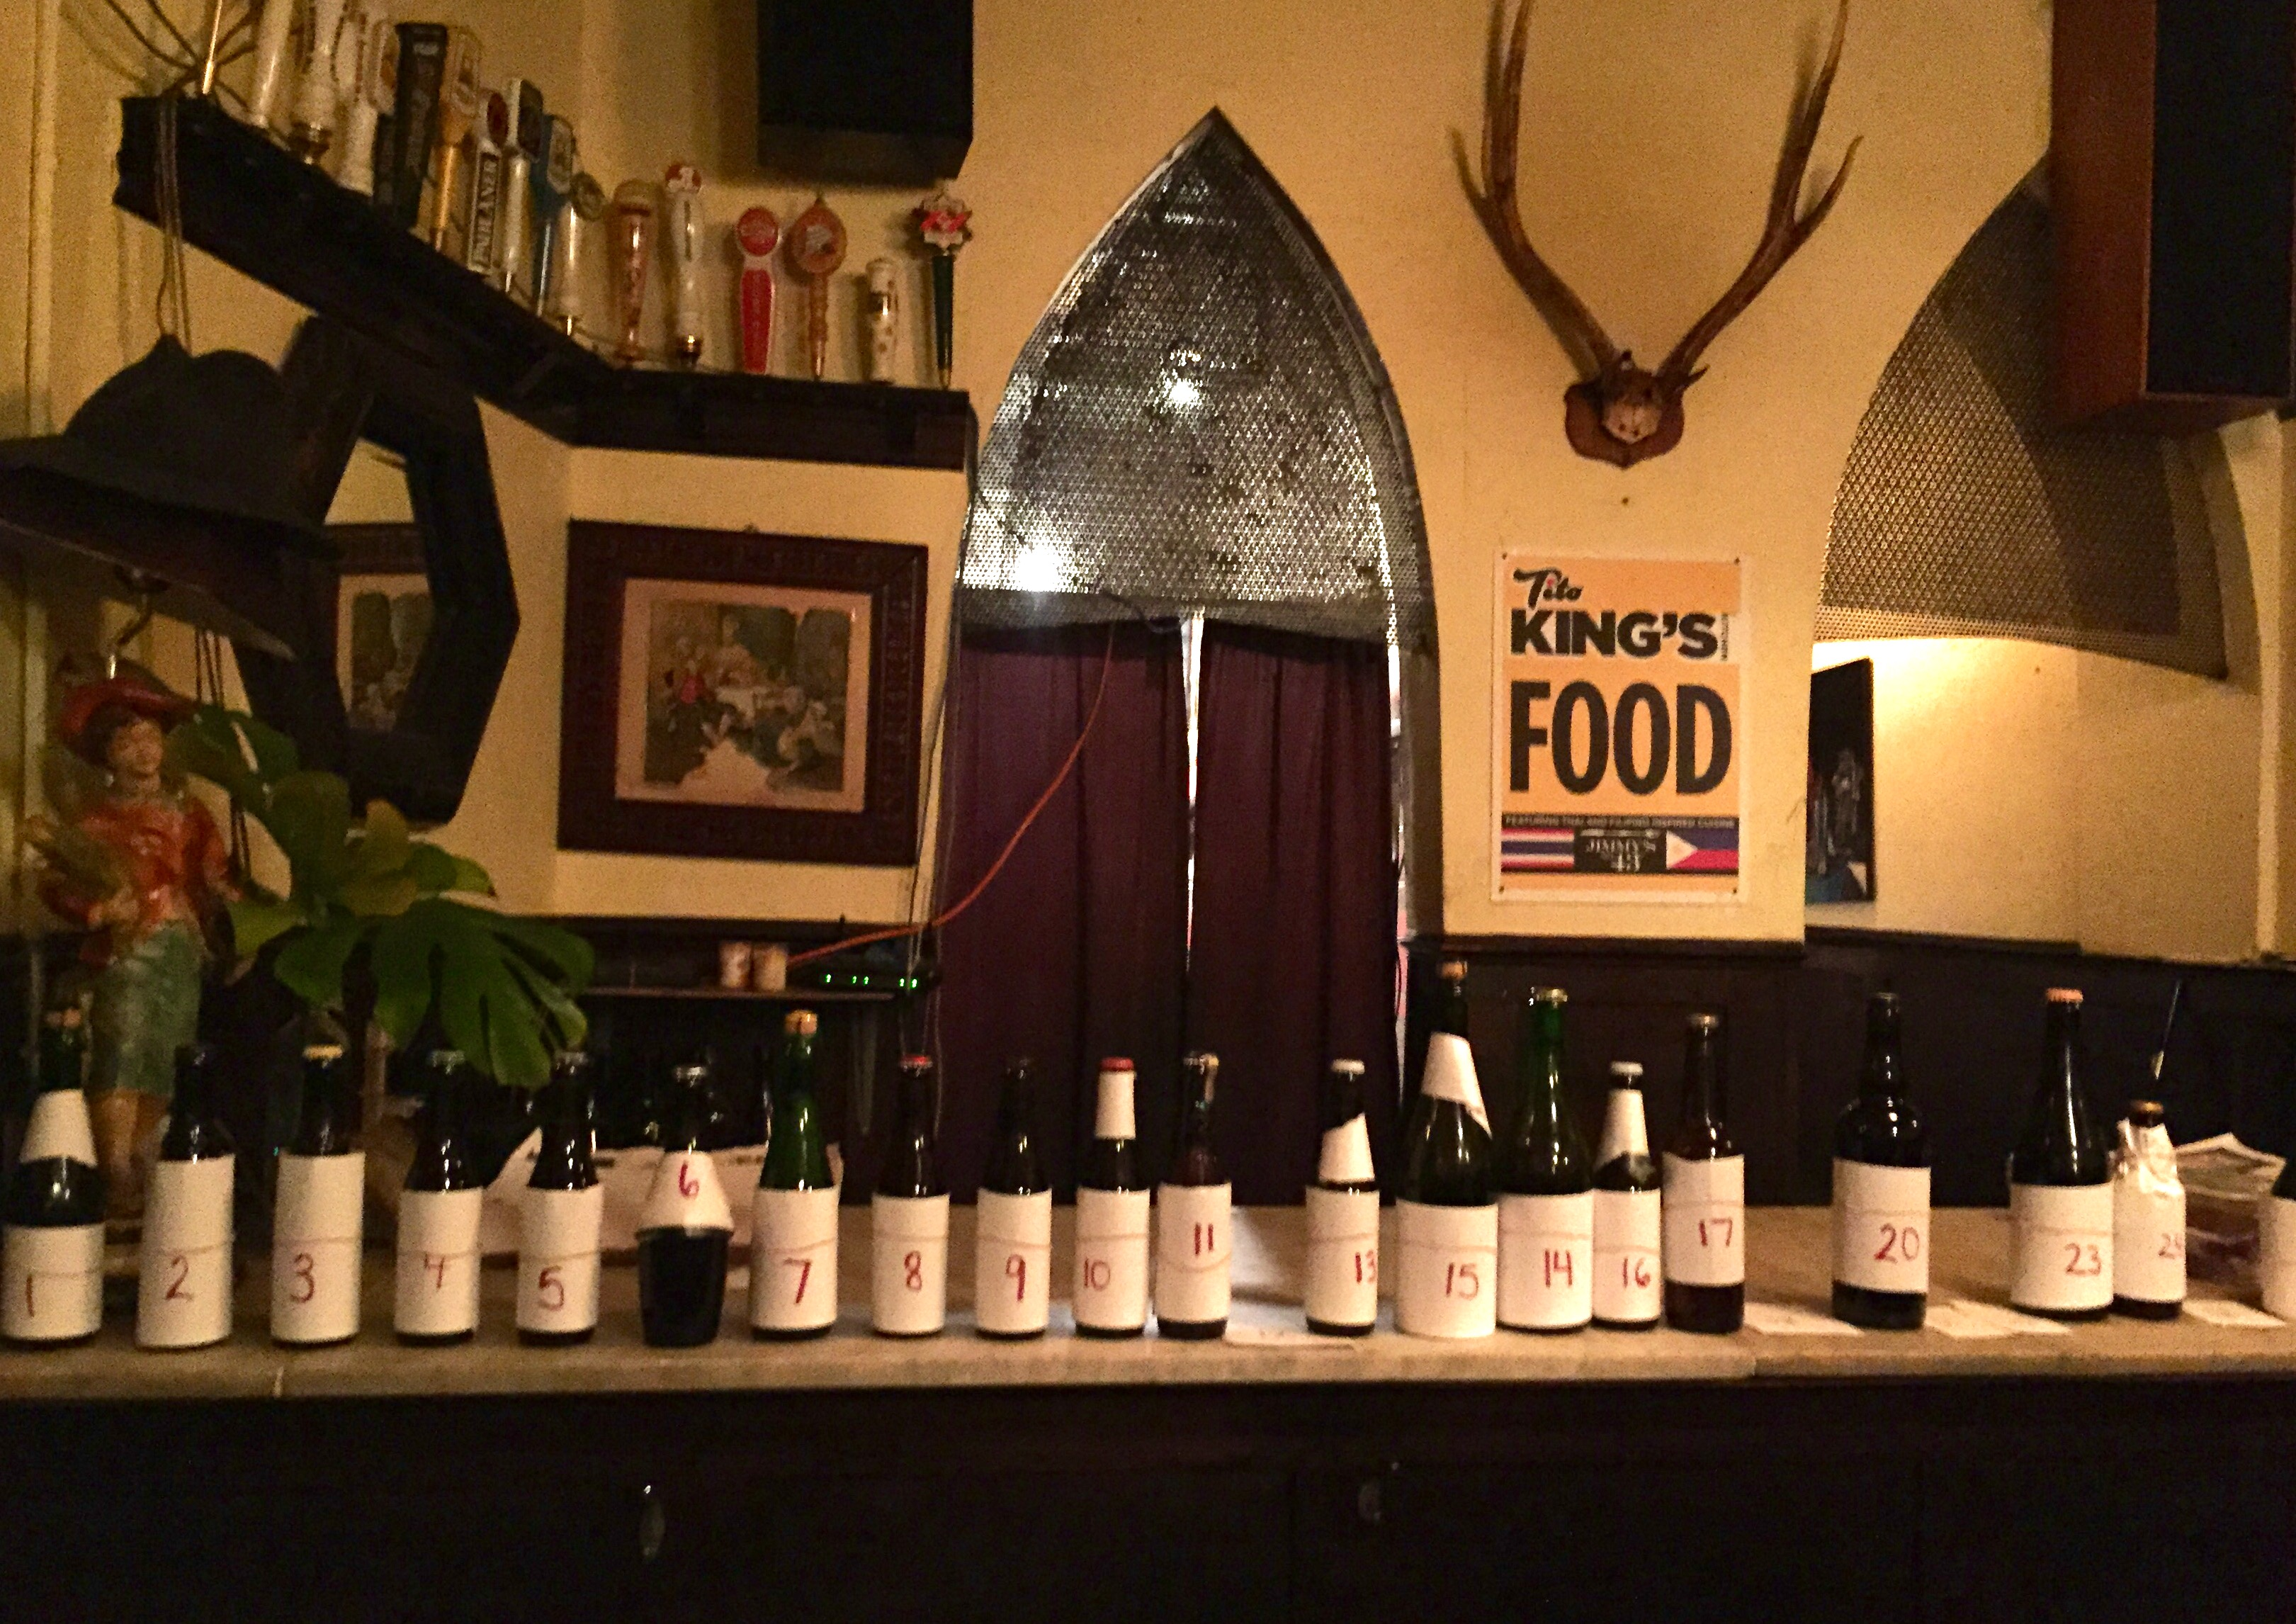 Battle_of_Belgians_bottles